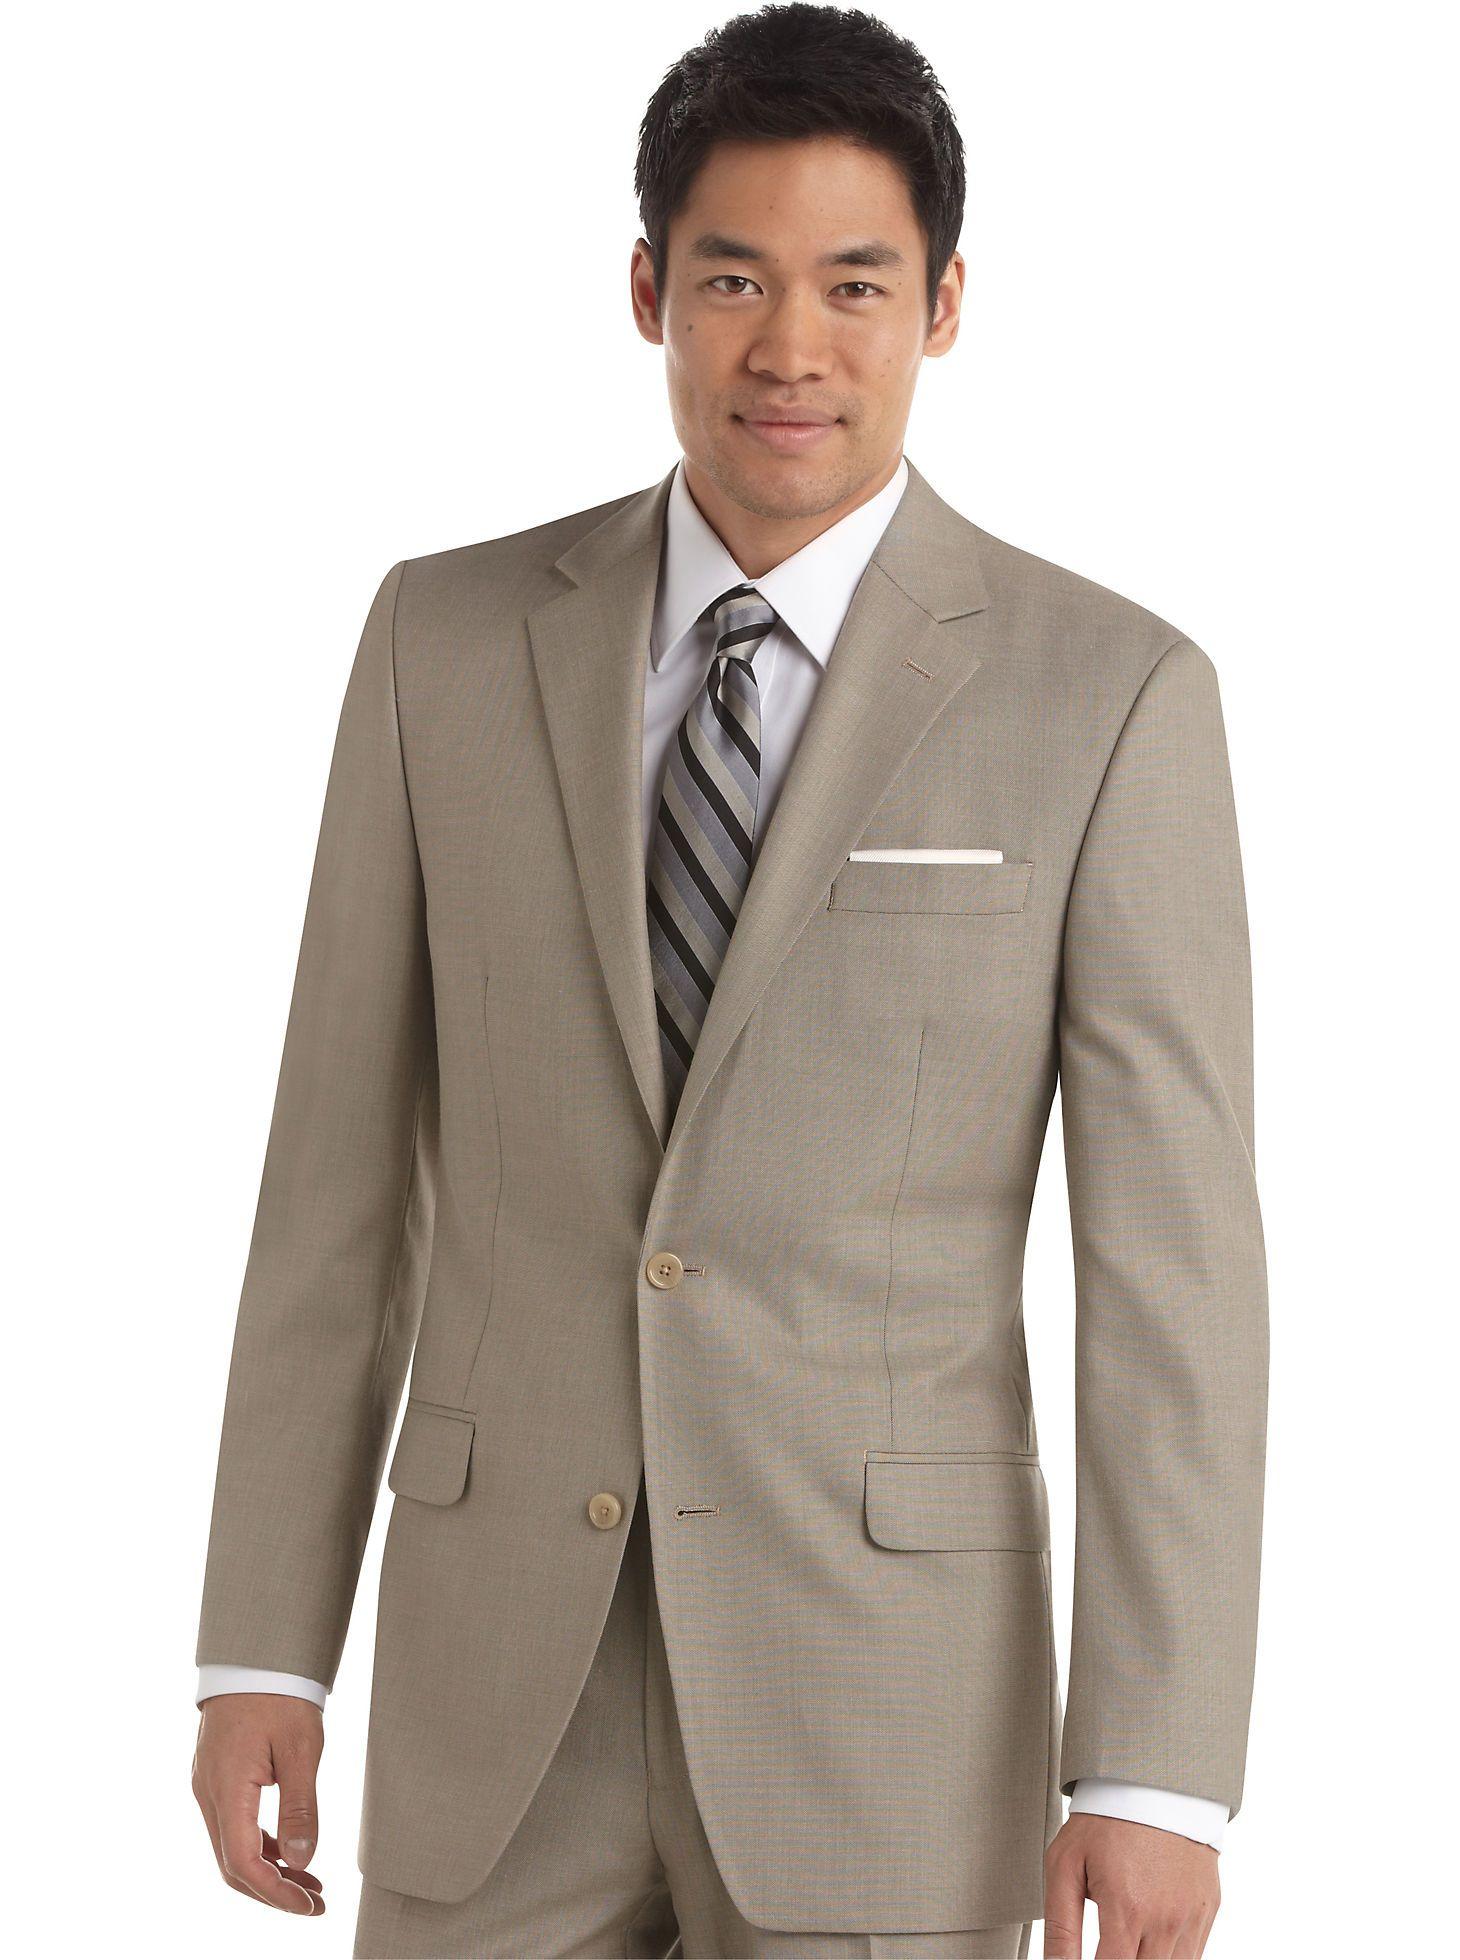 da4d40eec5b0be Mens Warehouse Suits - Michael Kors Tan Sharkskin Slim Fit Suit - Men's  Wearhouse